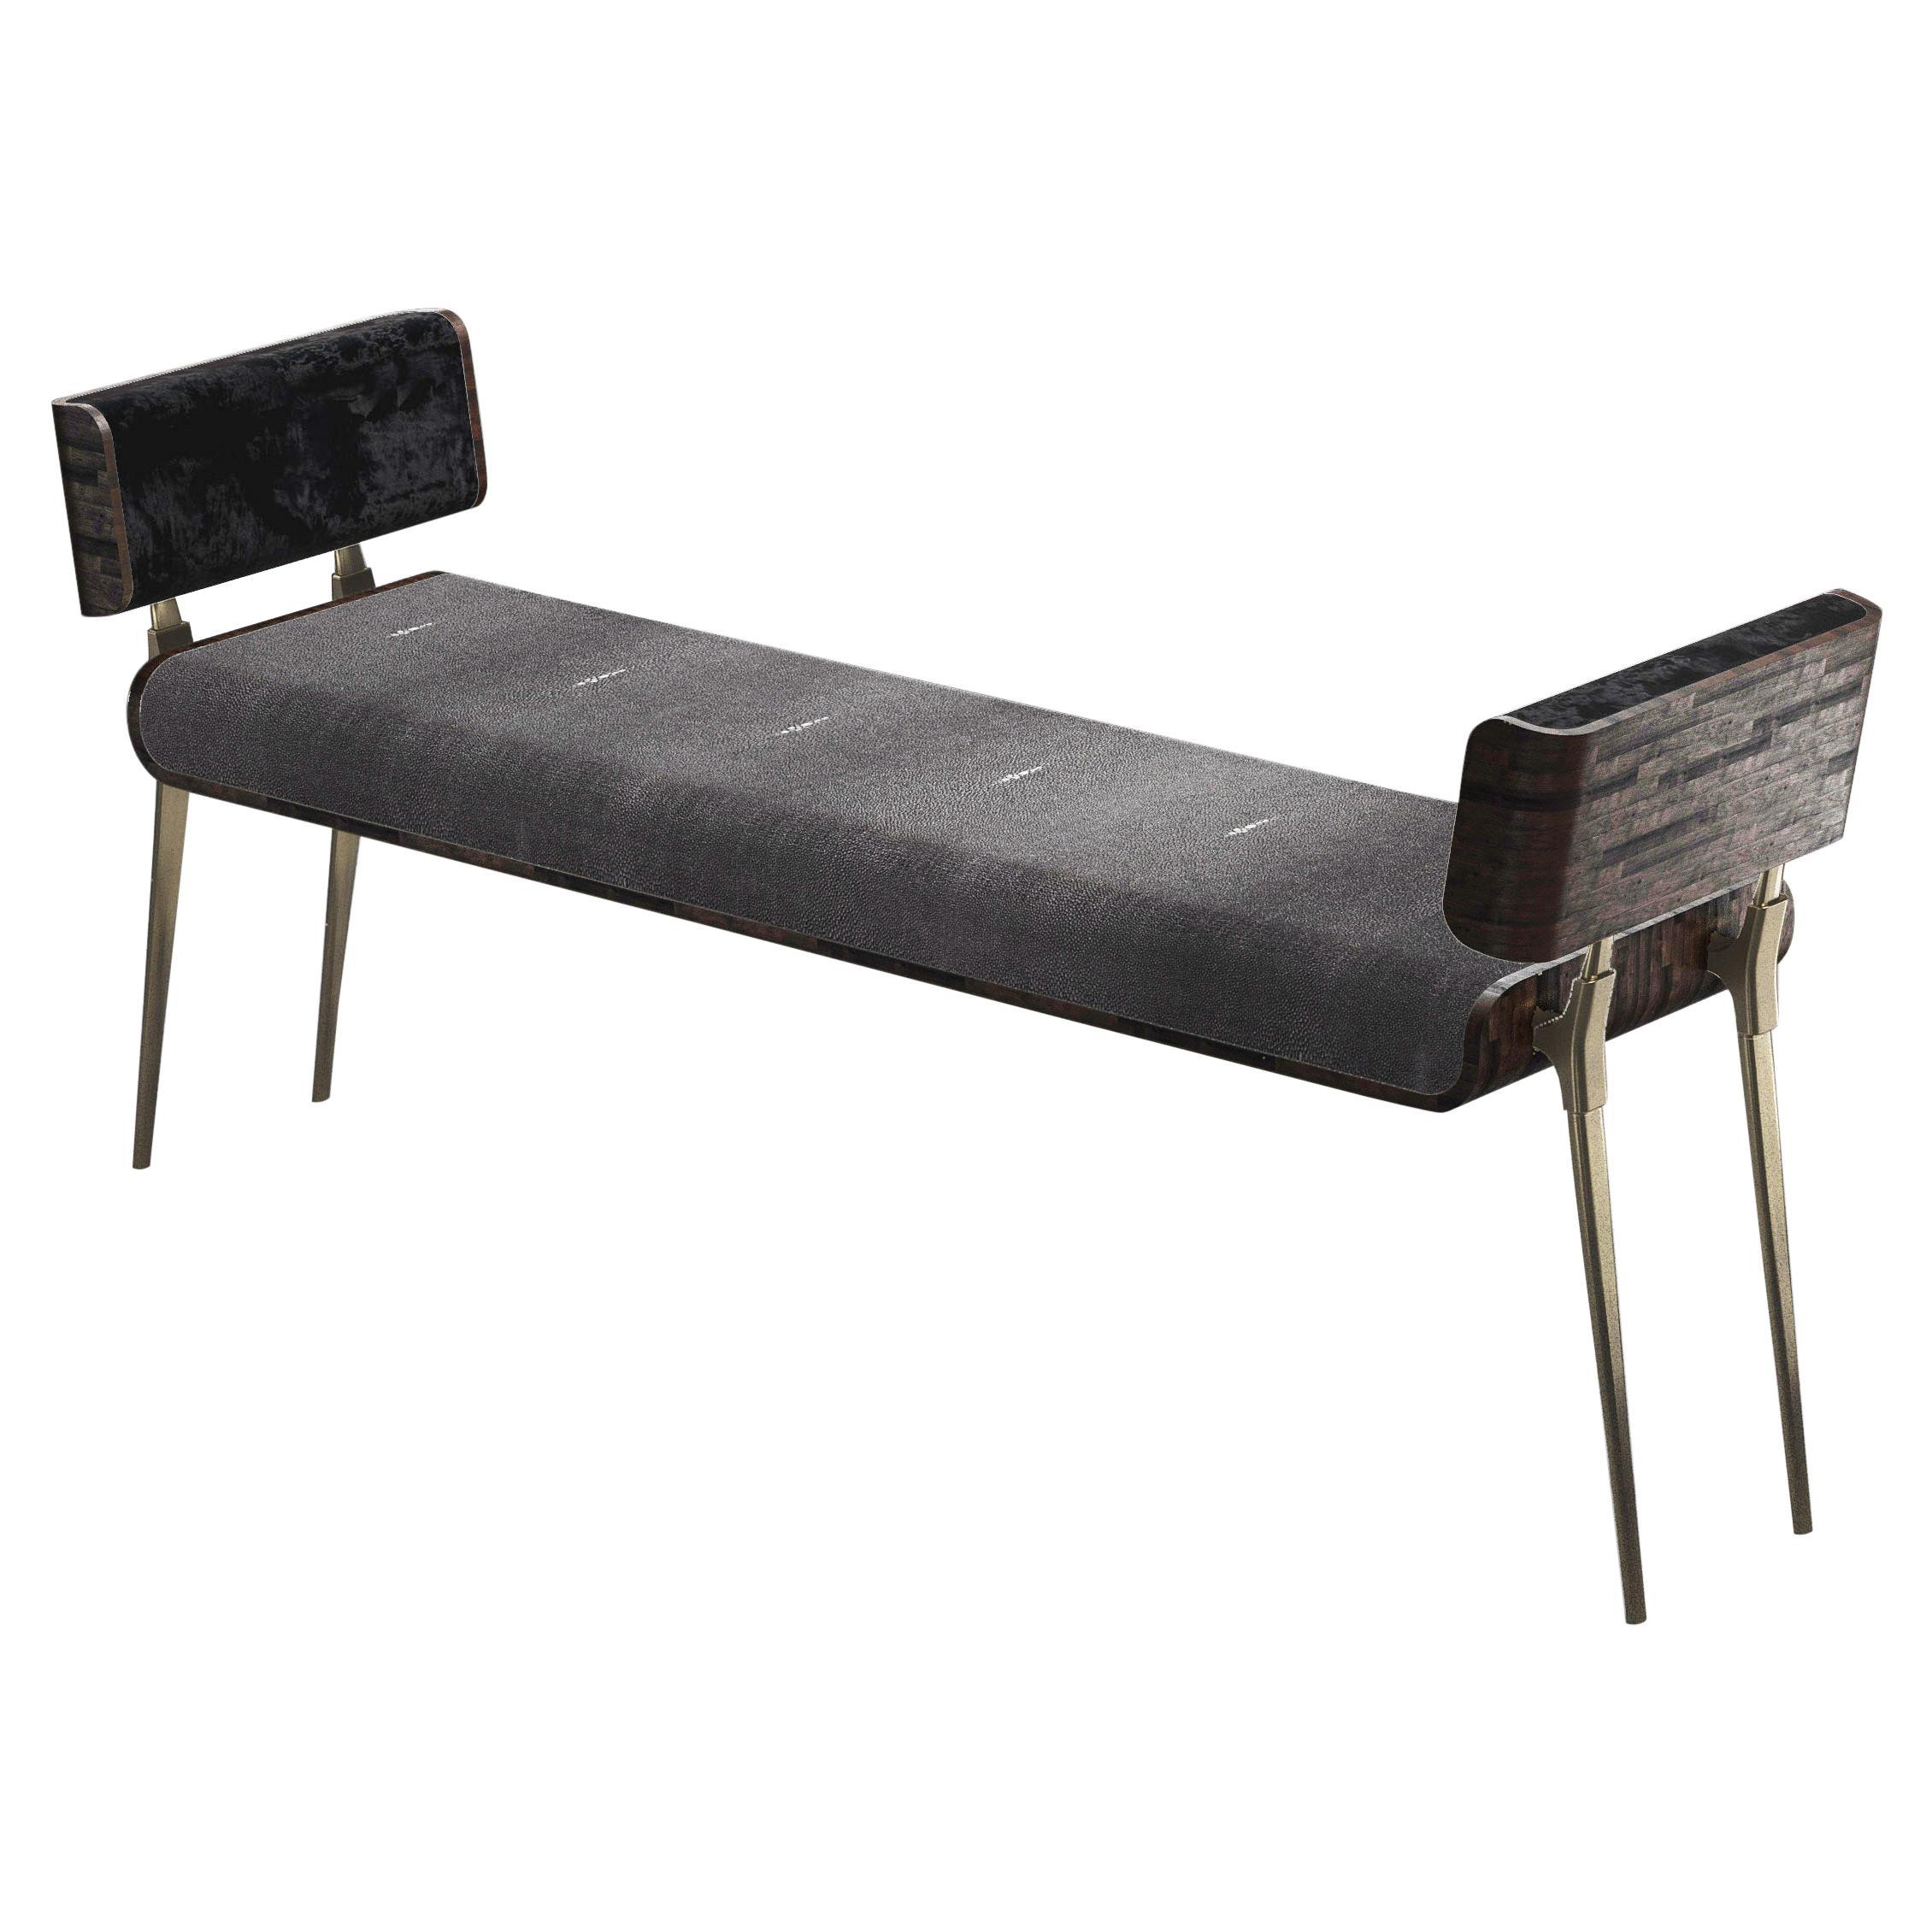 Shagreen Bench with Palmwood and Bronze-Patina Brass Details by Kifu Paris